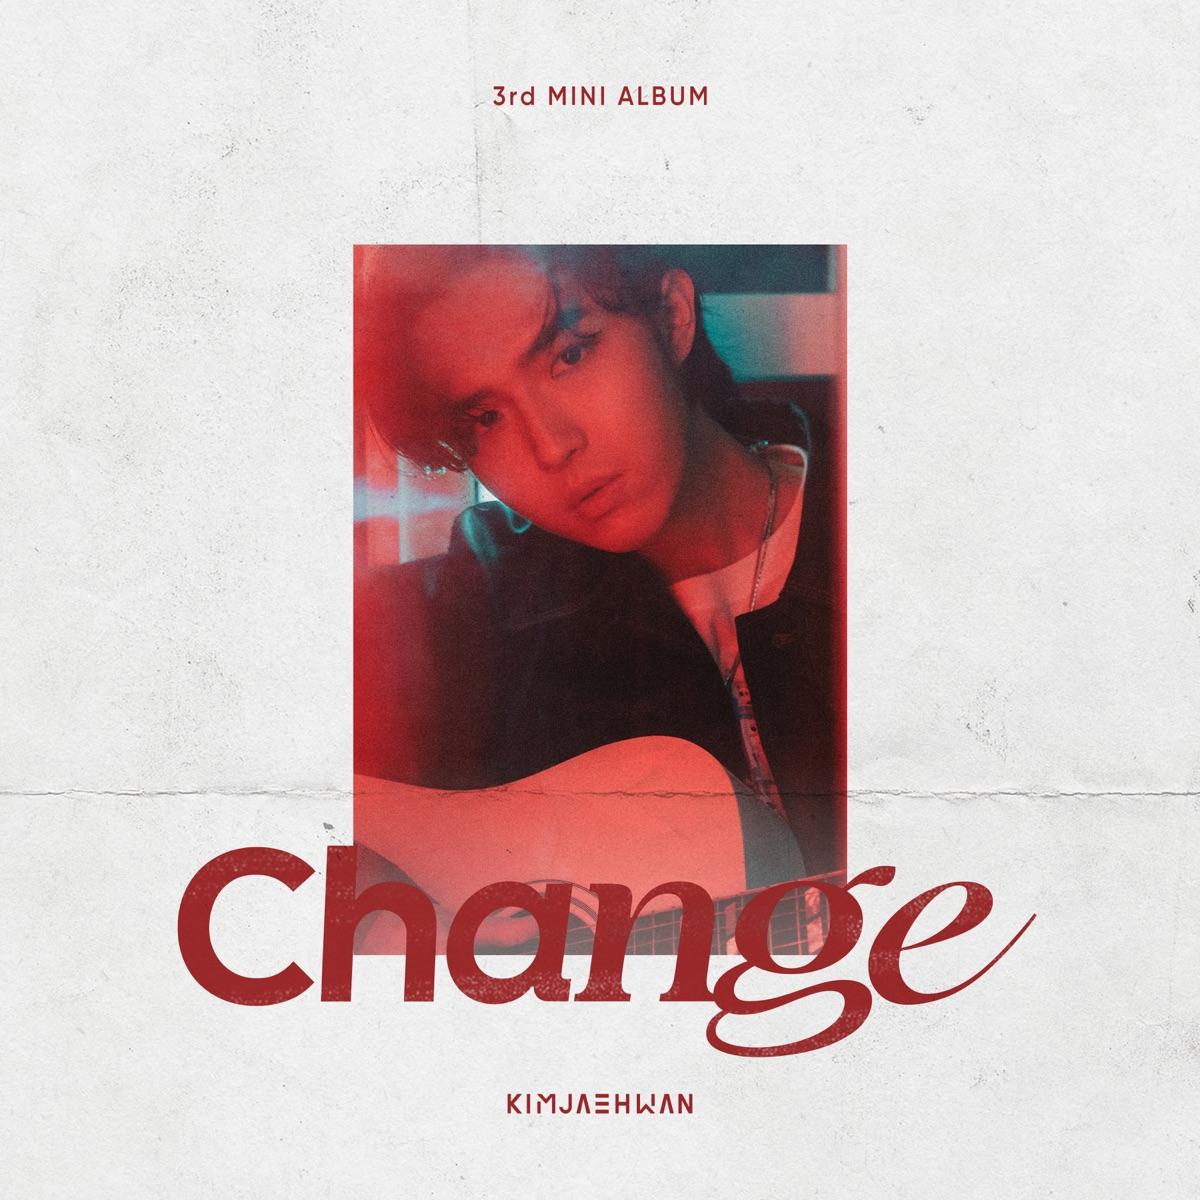 『KIM JAE HWAN - I Wouldn't Look For You』収録の『Change』ジャケット